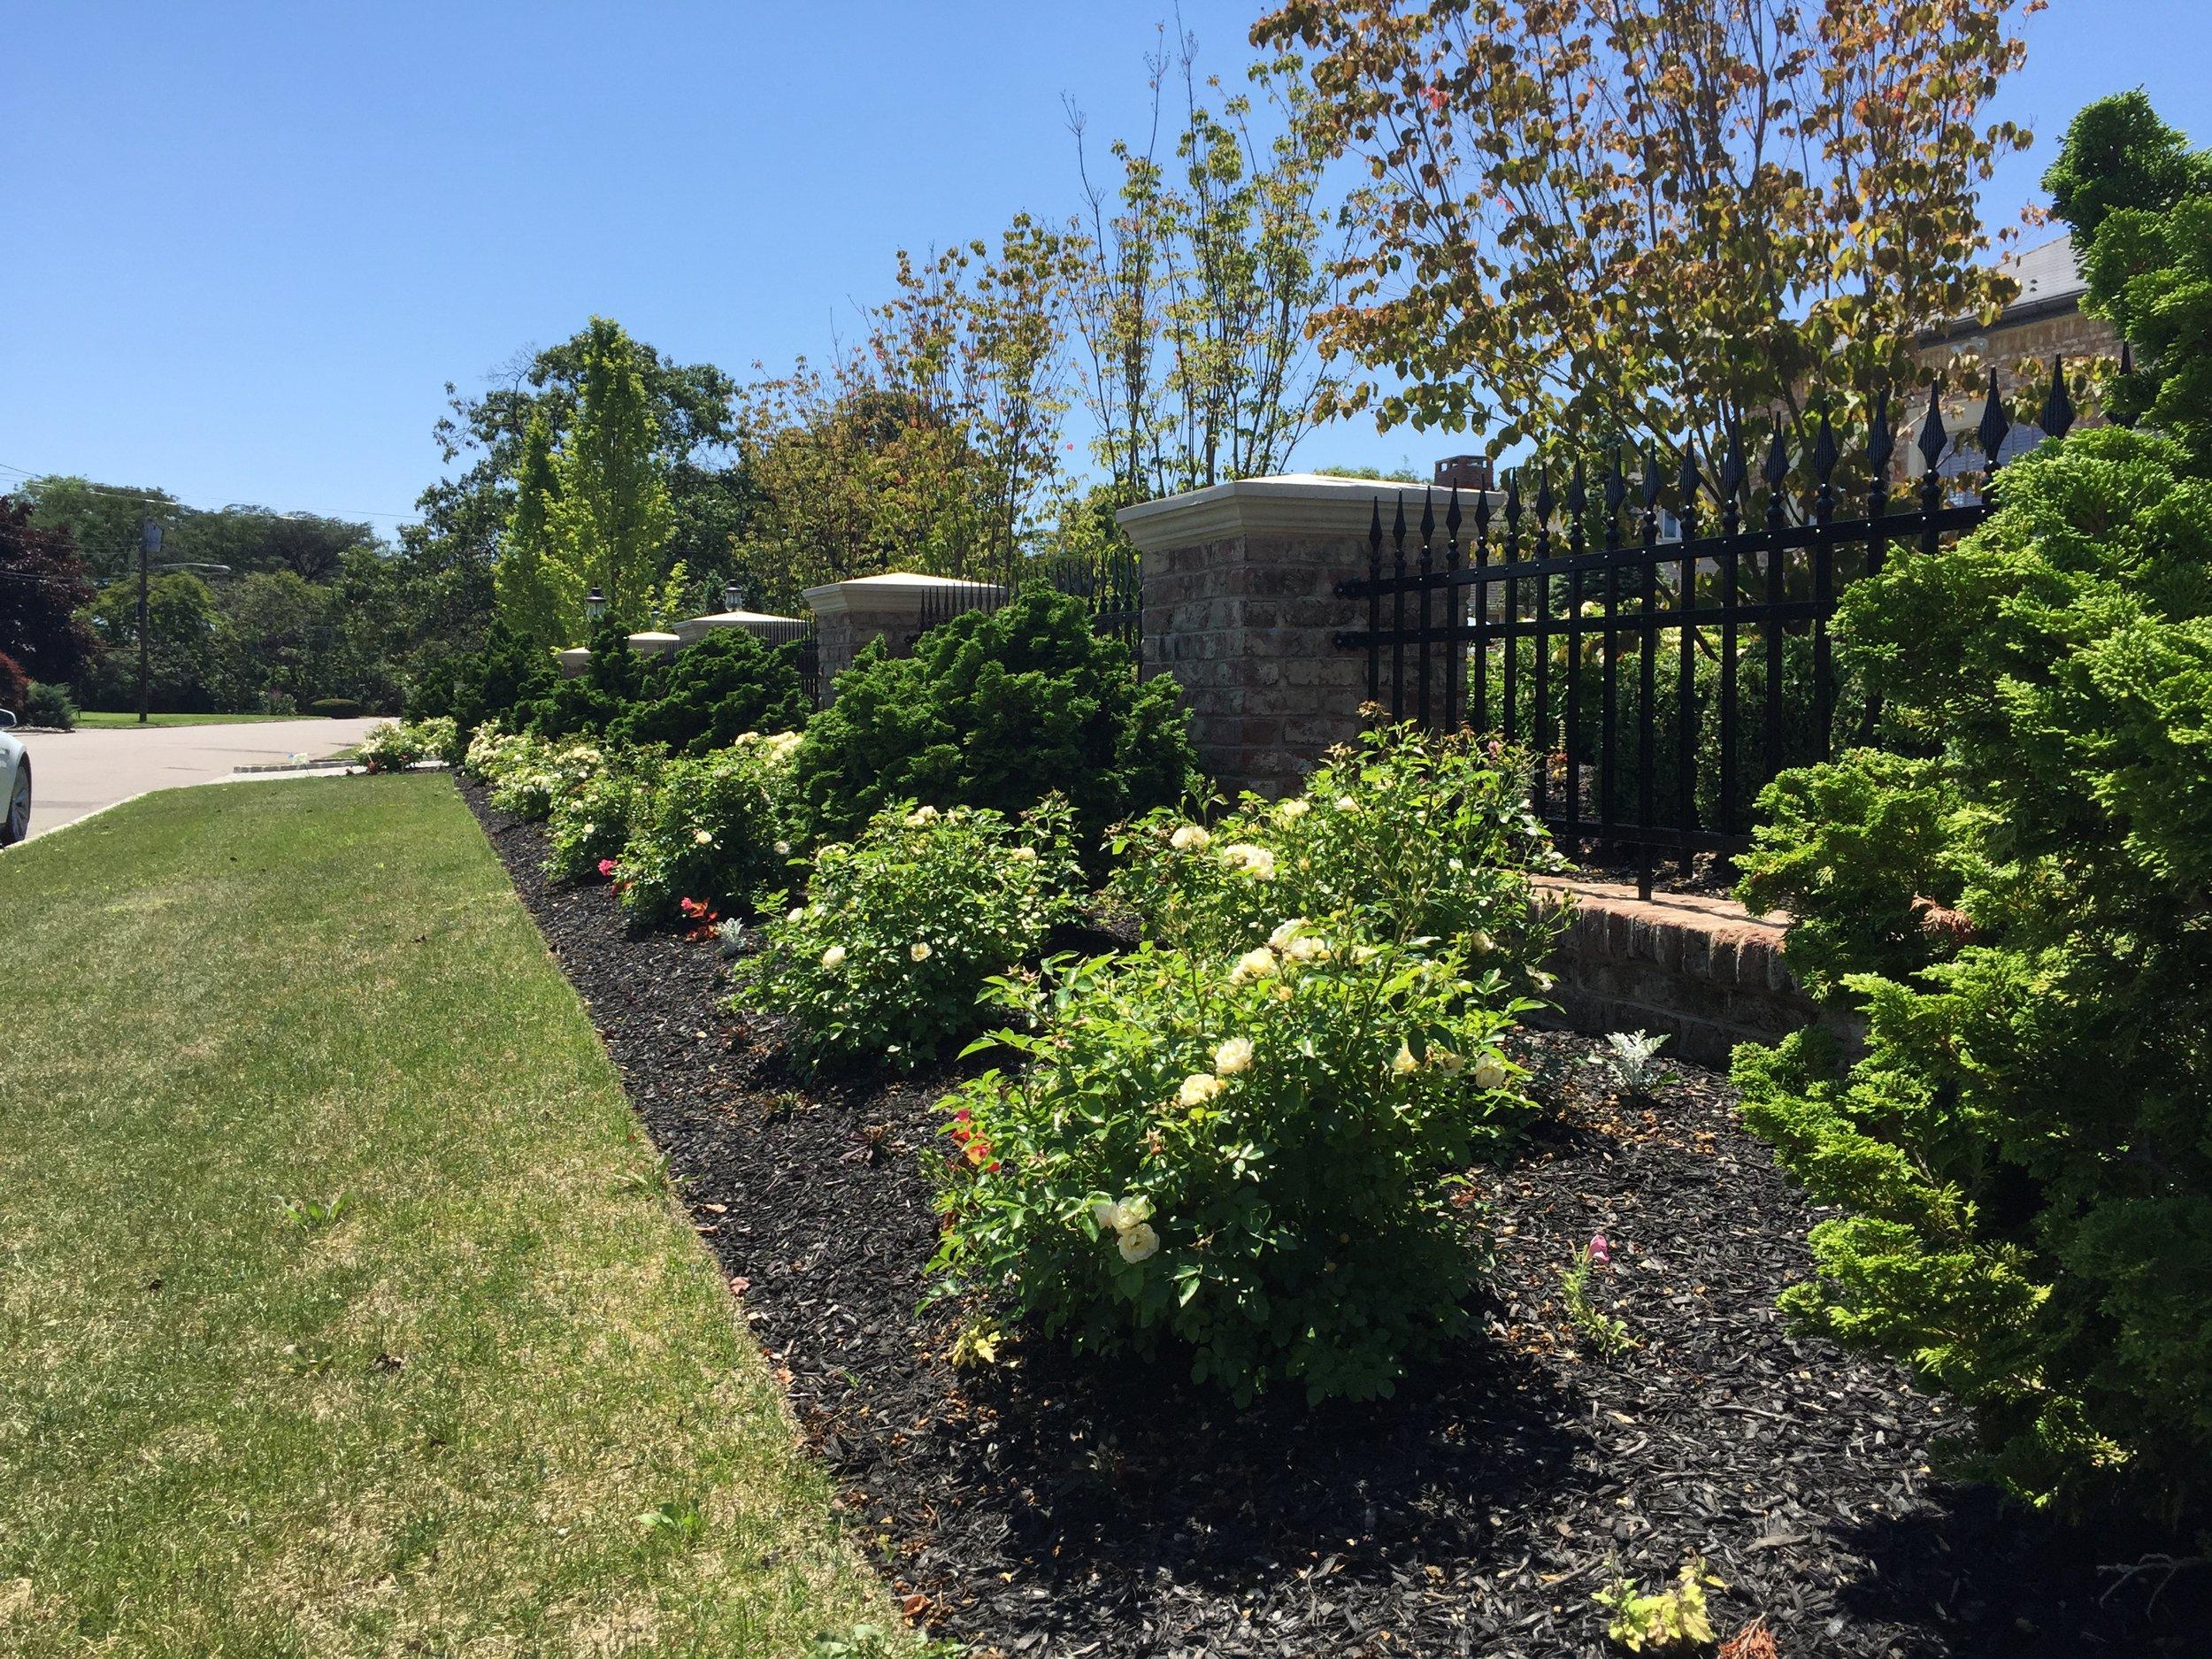 Top shrub planting design in Long Island, NY